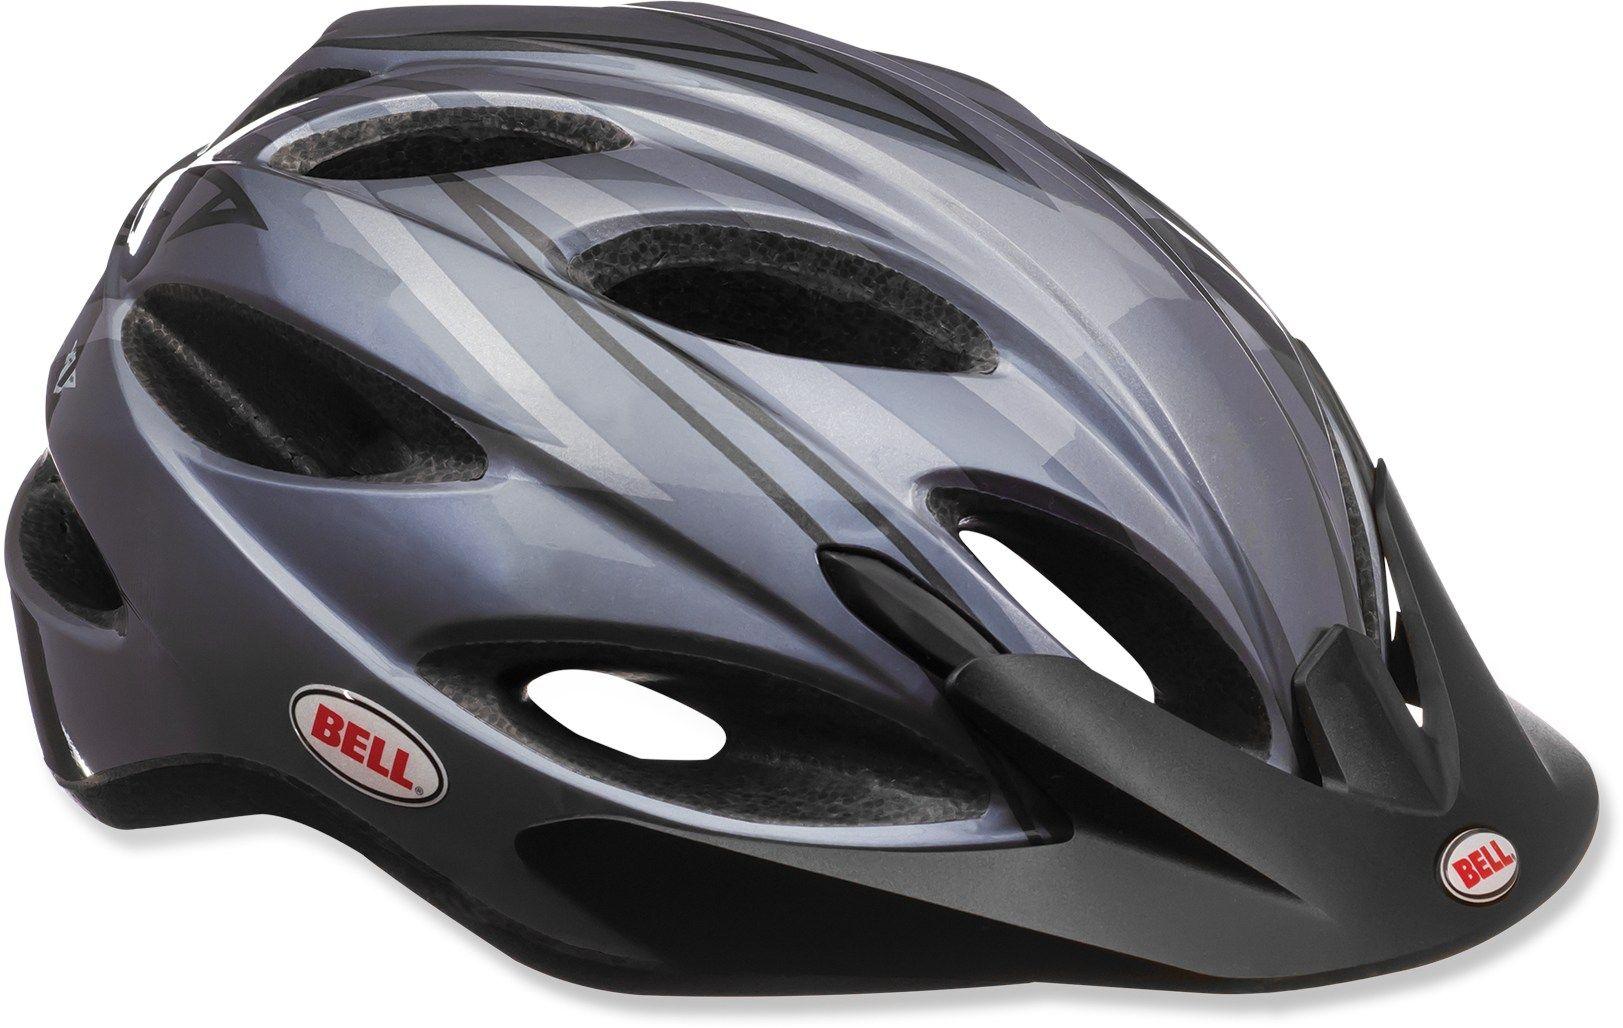 Bell Xlp Bike Helmet Helmet Bike Bell Helmet